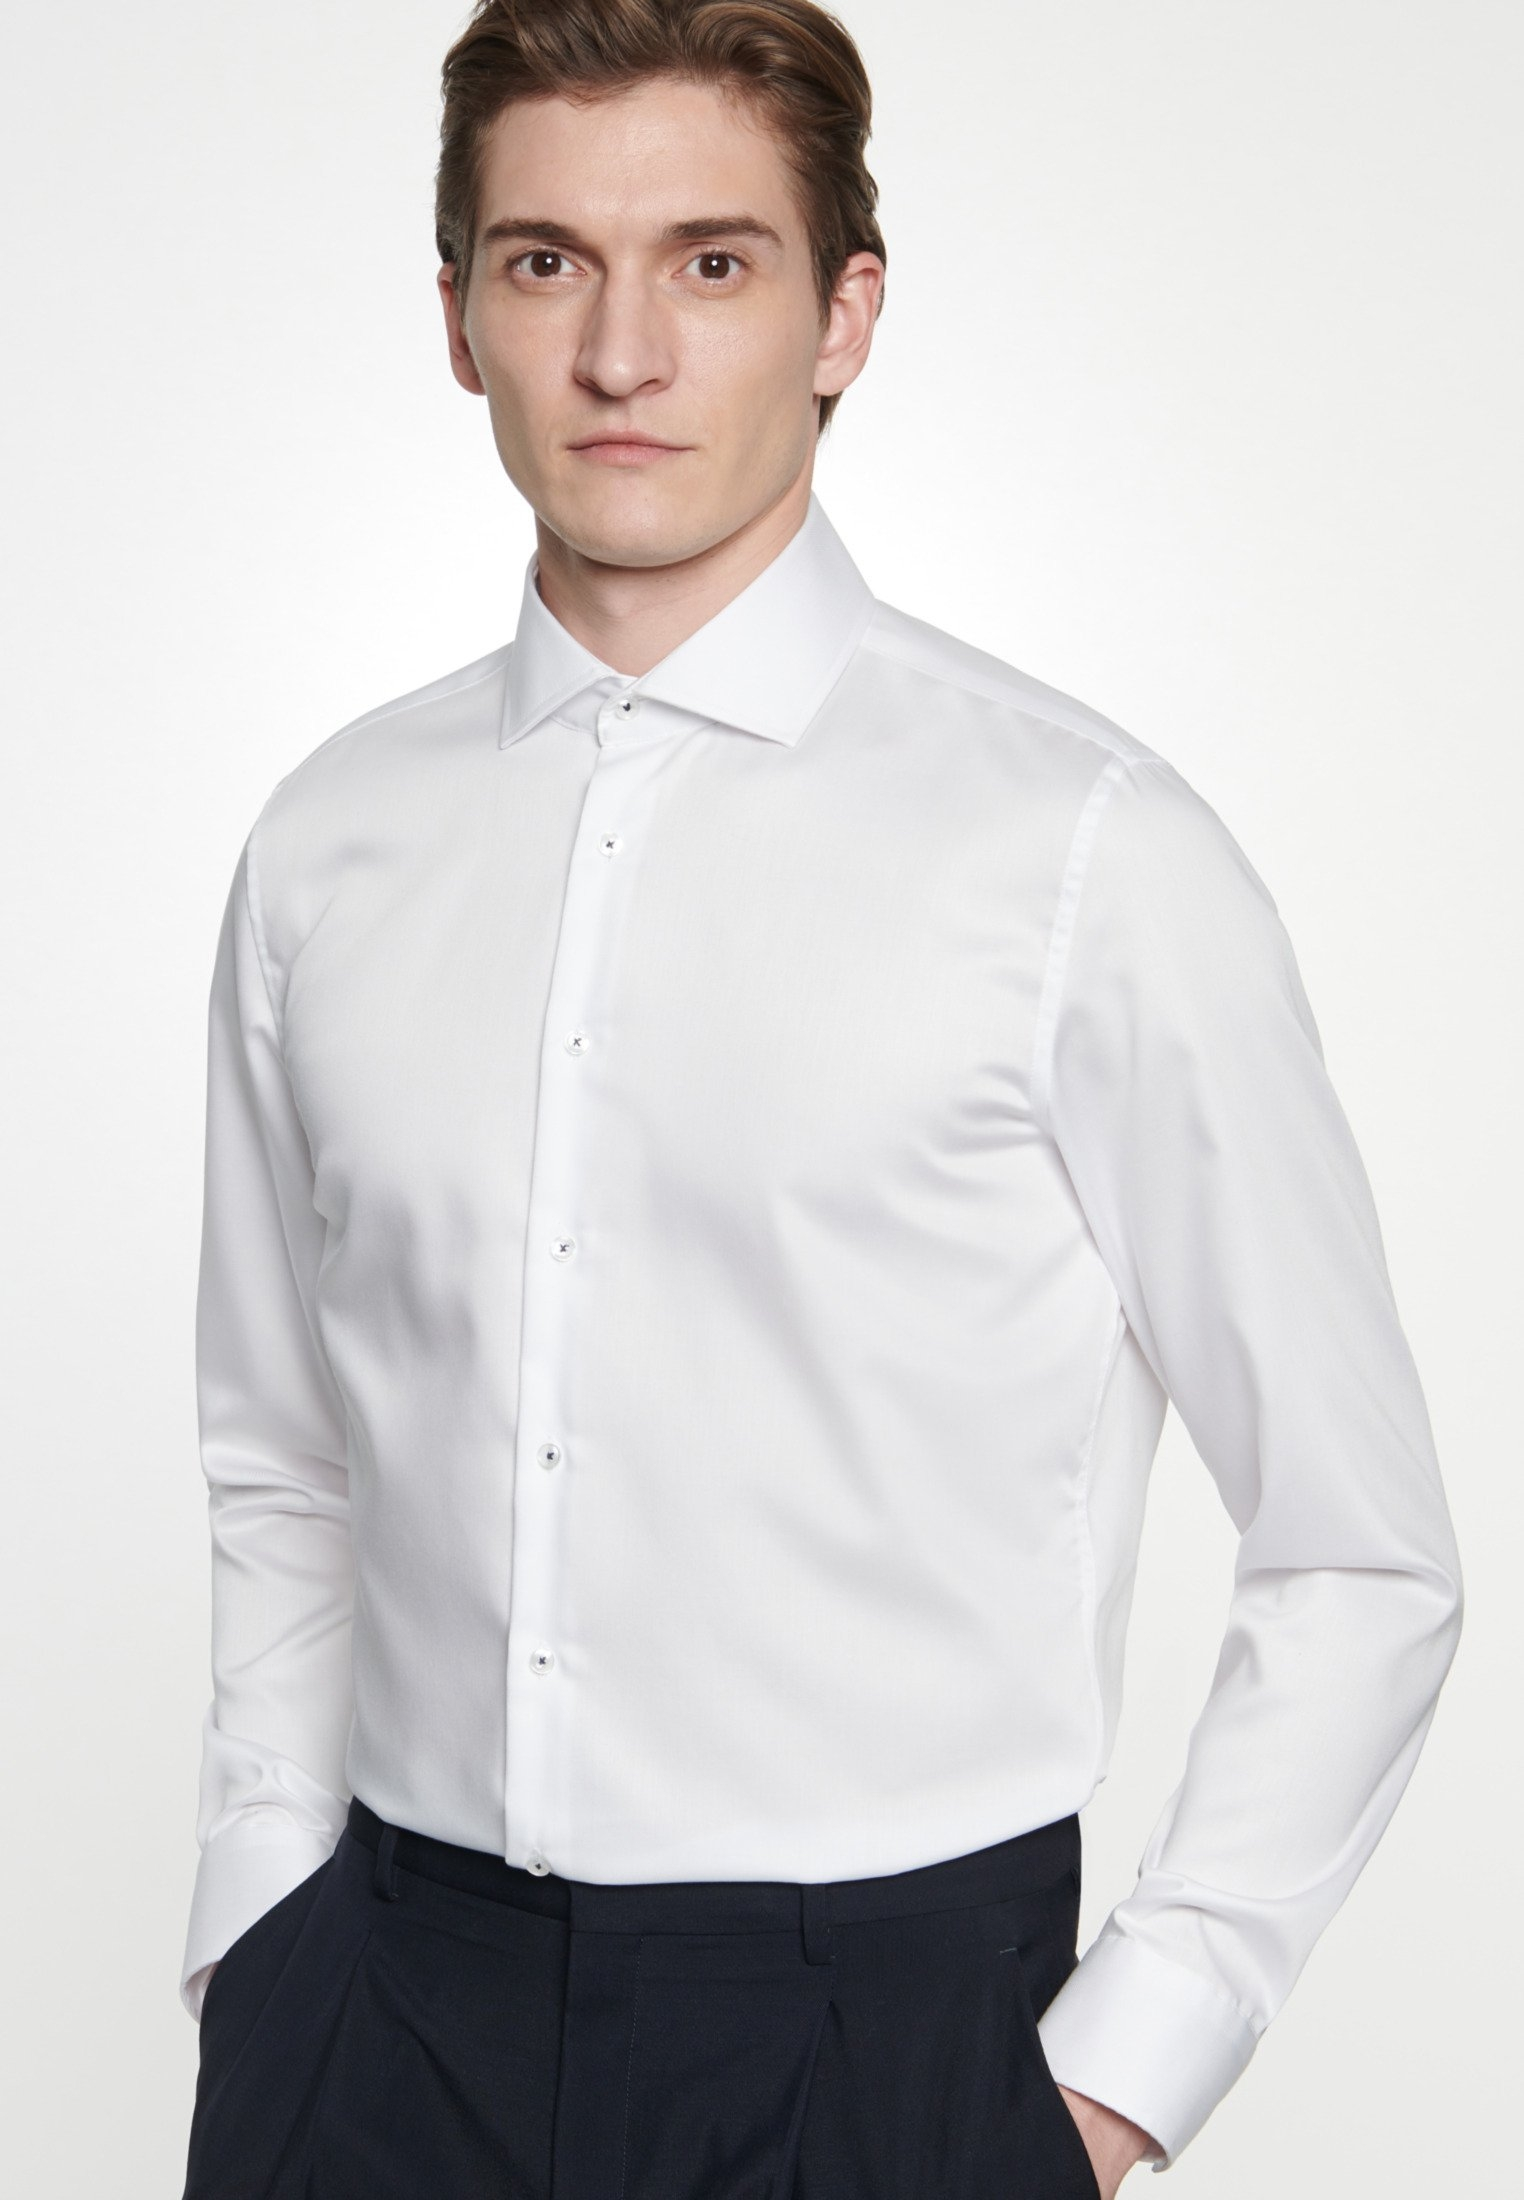 seidensticker businessoverhemd SLIM Slim lange mouwen kentkraag uni nu online kopen bij OTTO